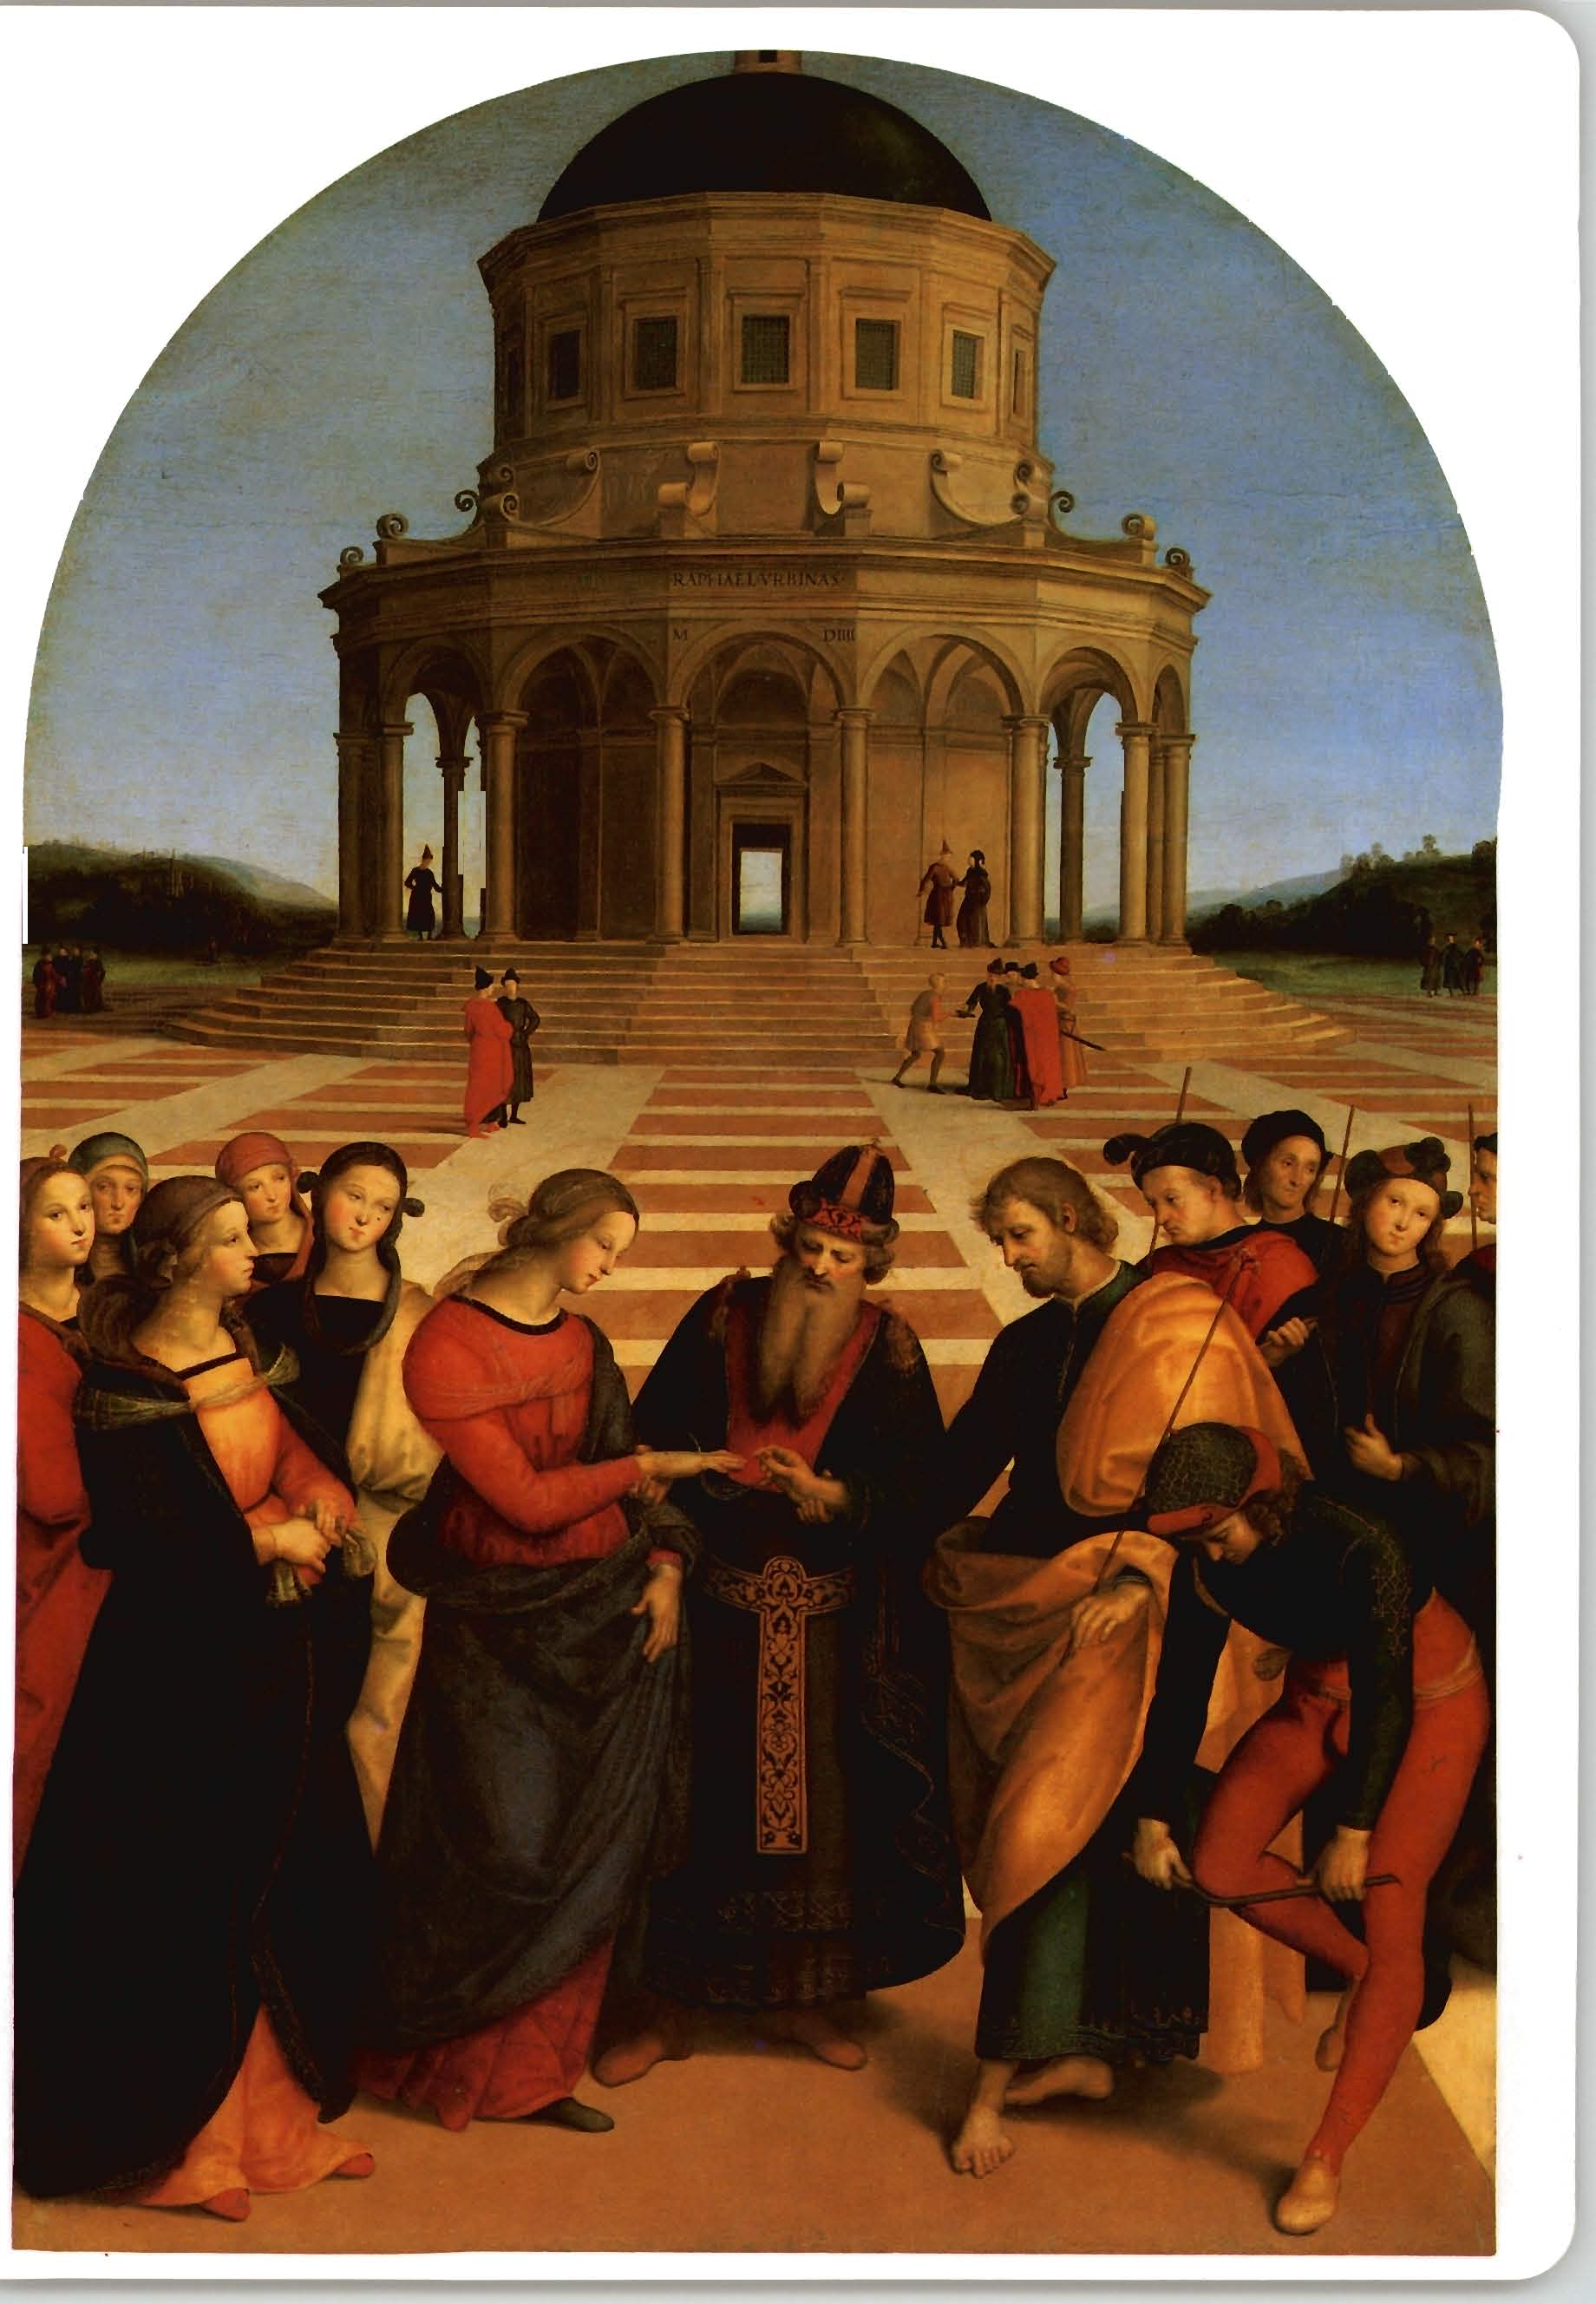 Rafael. Casamento da Virgem. 1504.